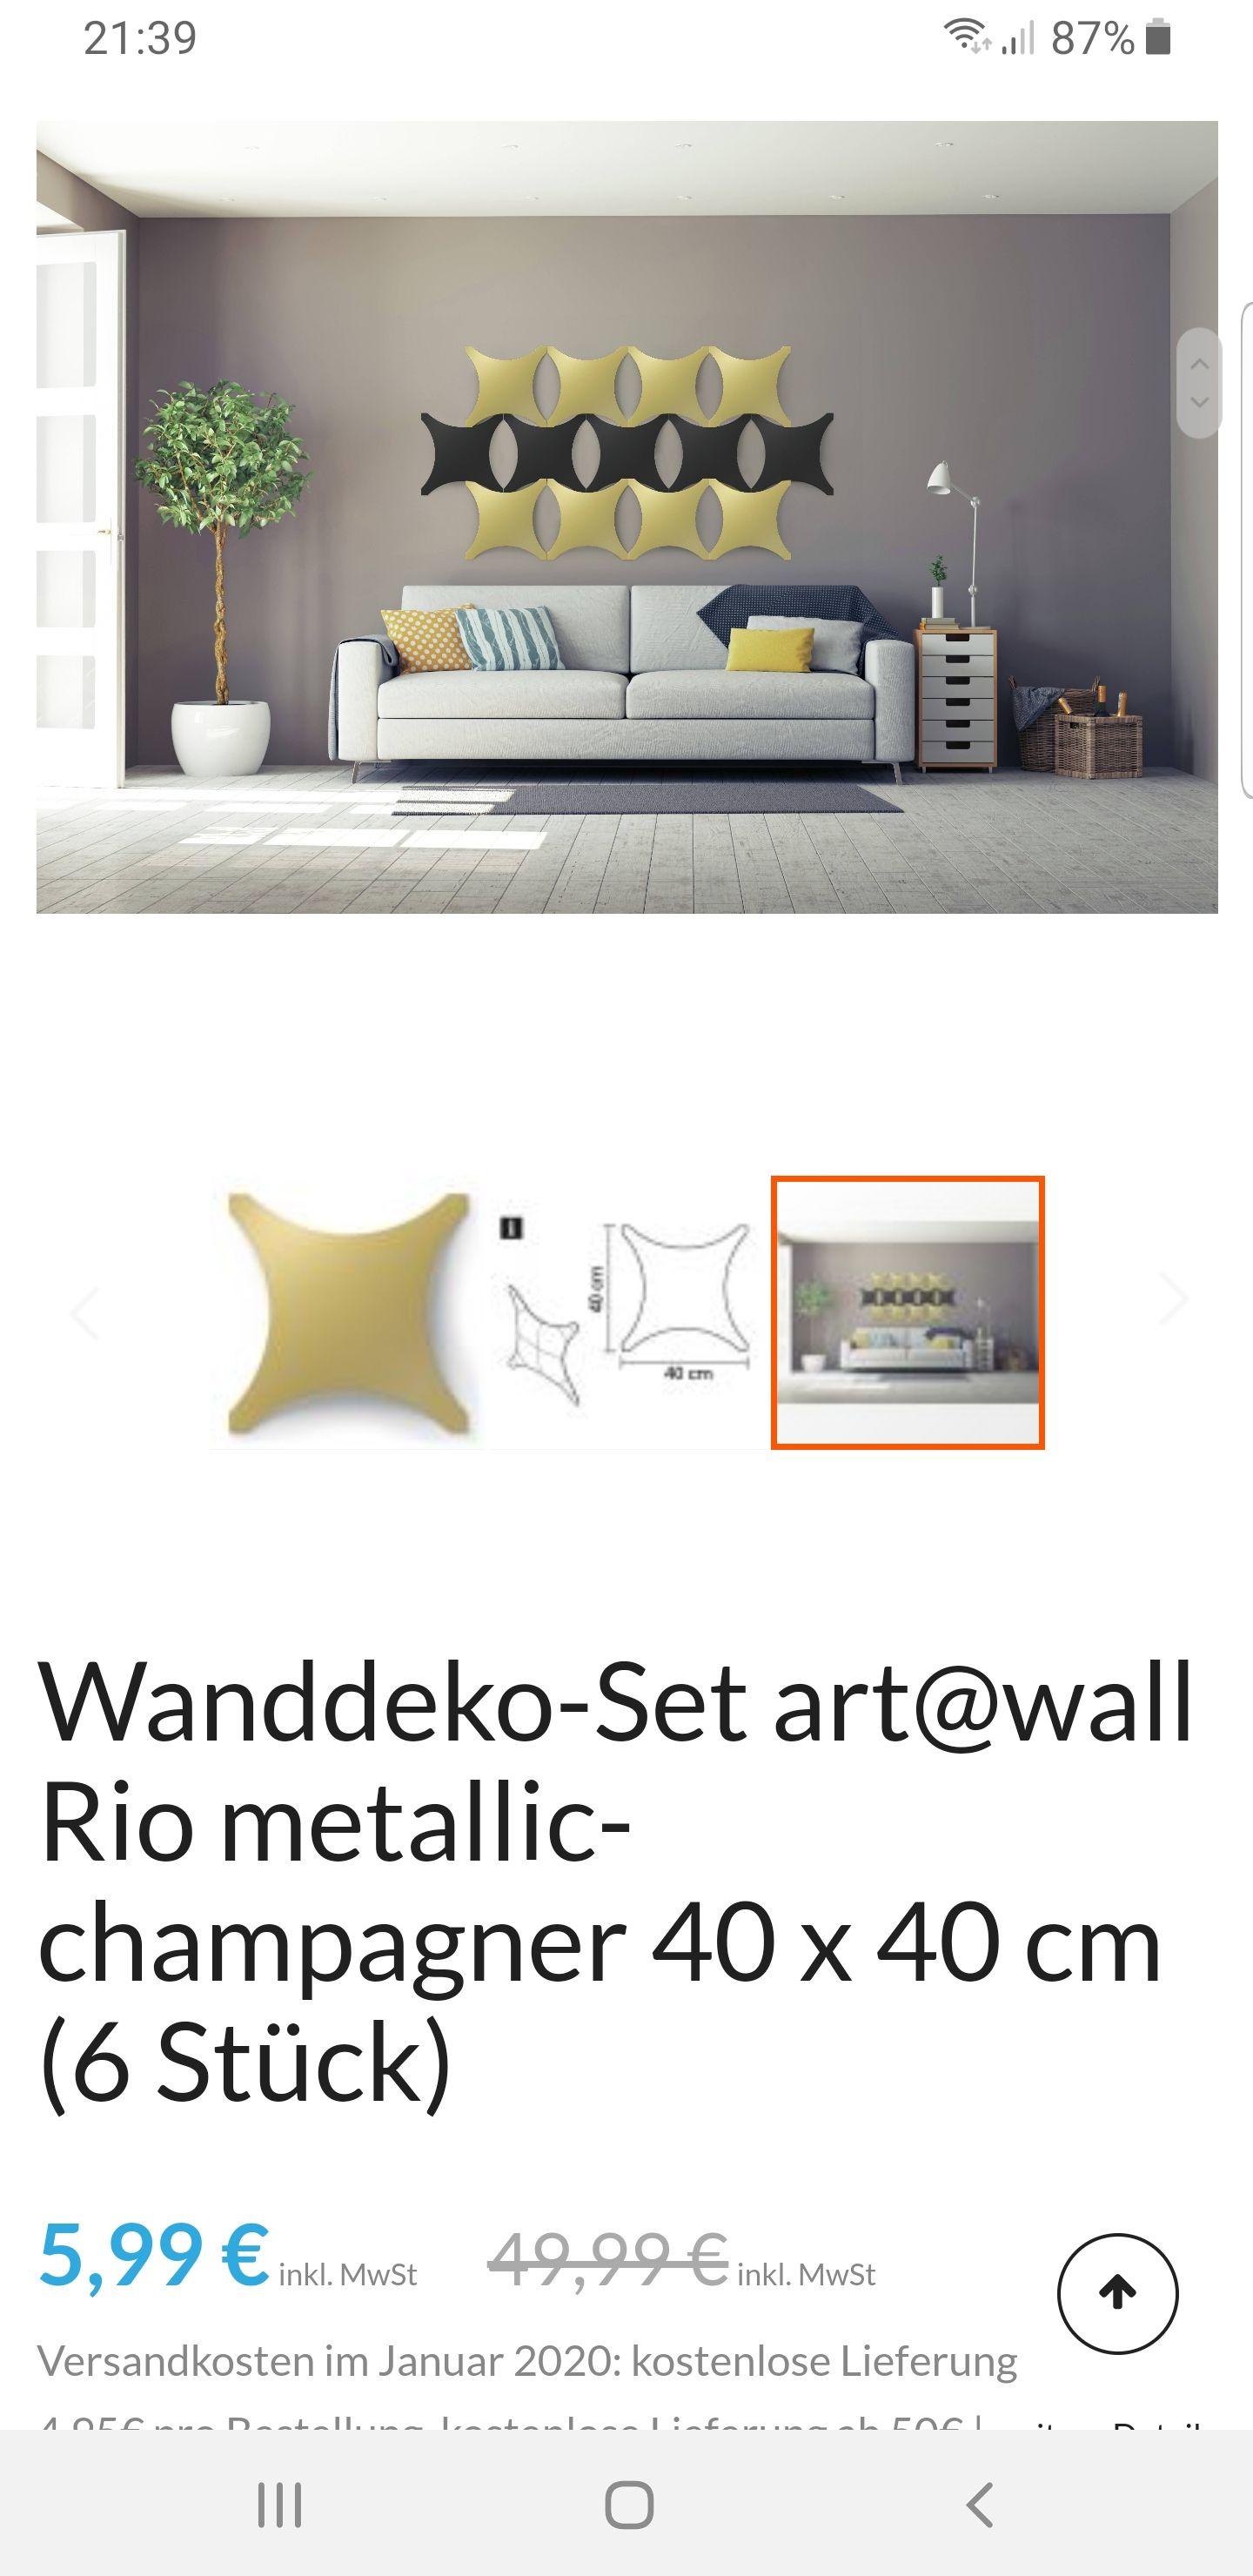 Preisfehler! Wanddeko-Set art@wall Rio metallic-champagner 40 x 40 cm (6 Stück)